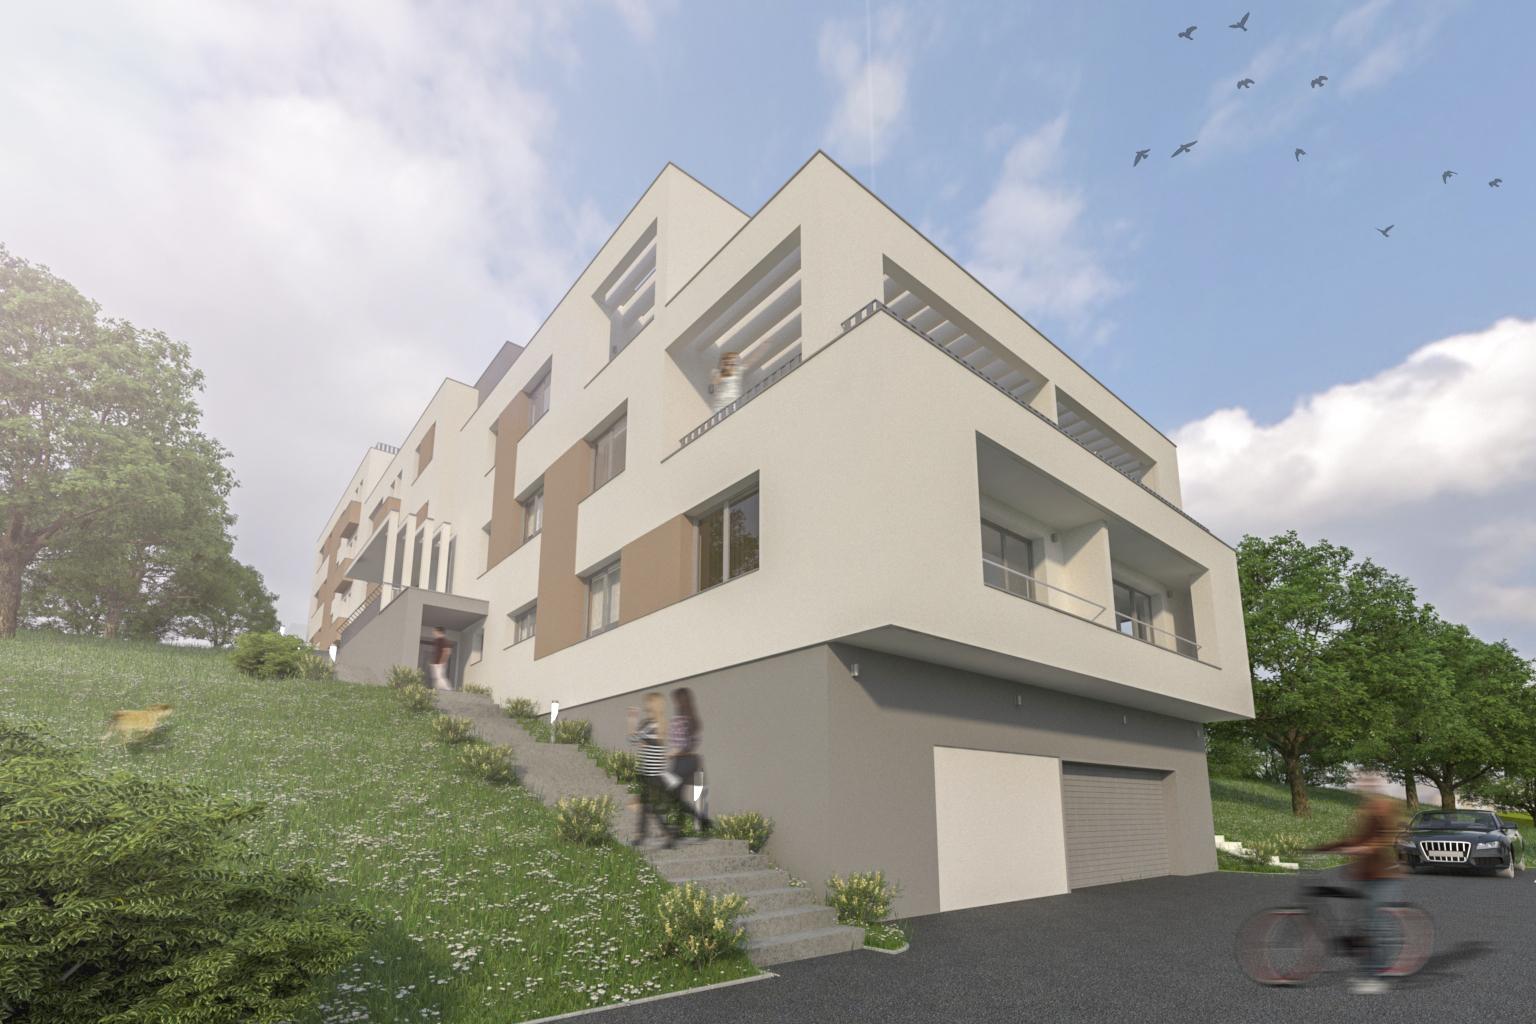 Imobil locuințe colective Bulevardul Muncii